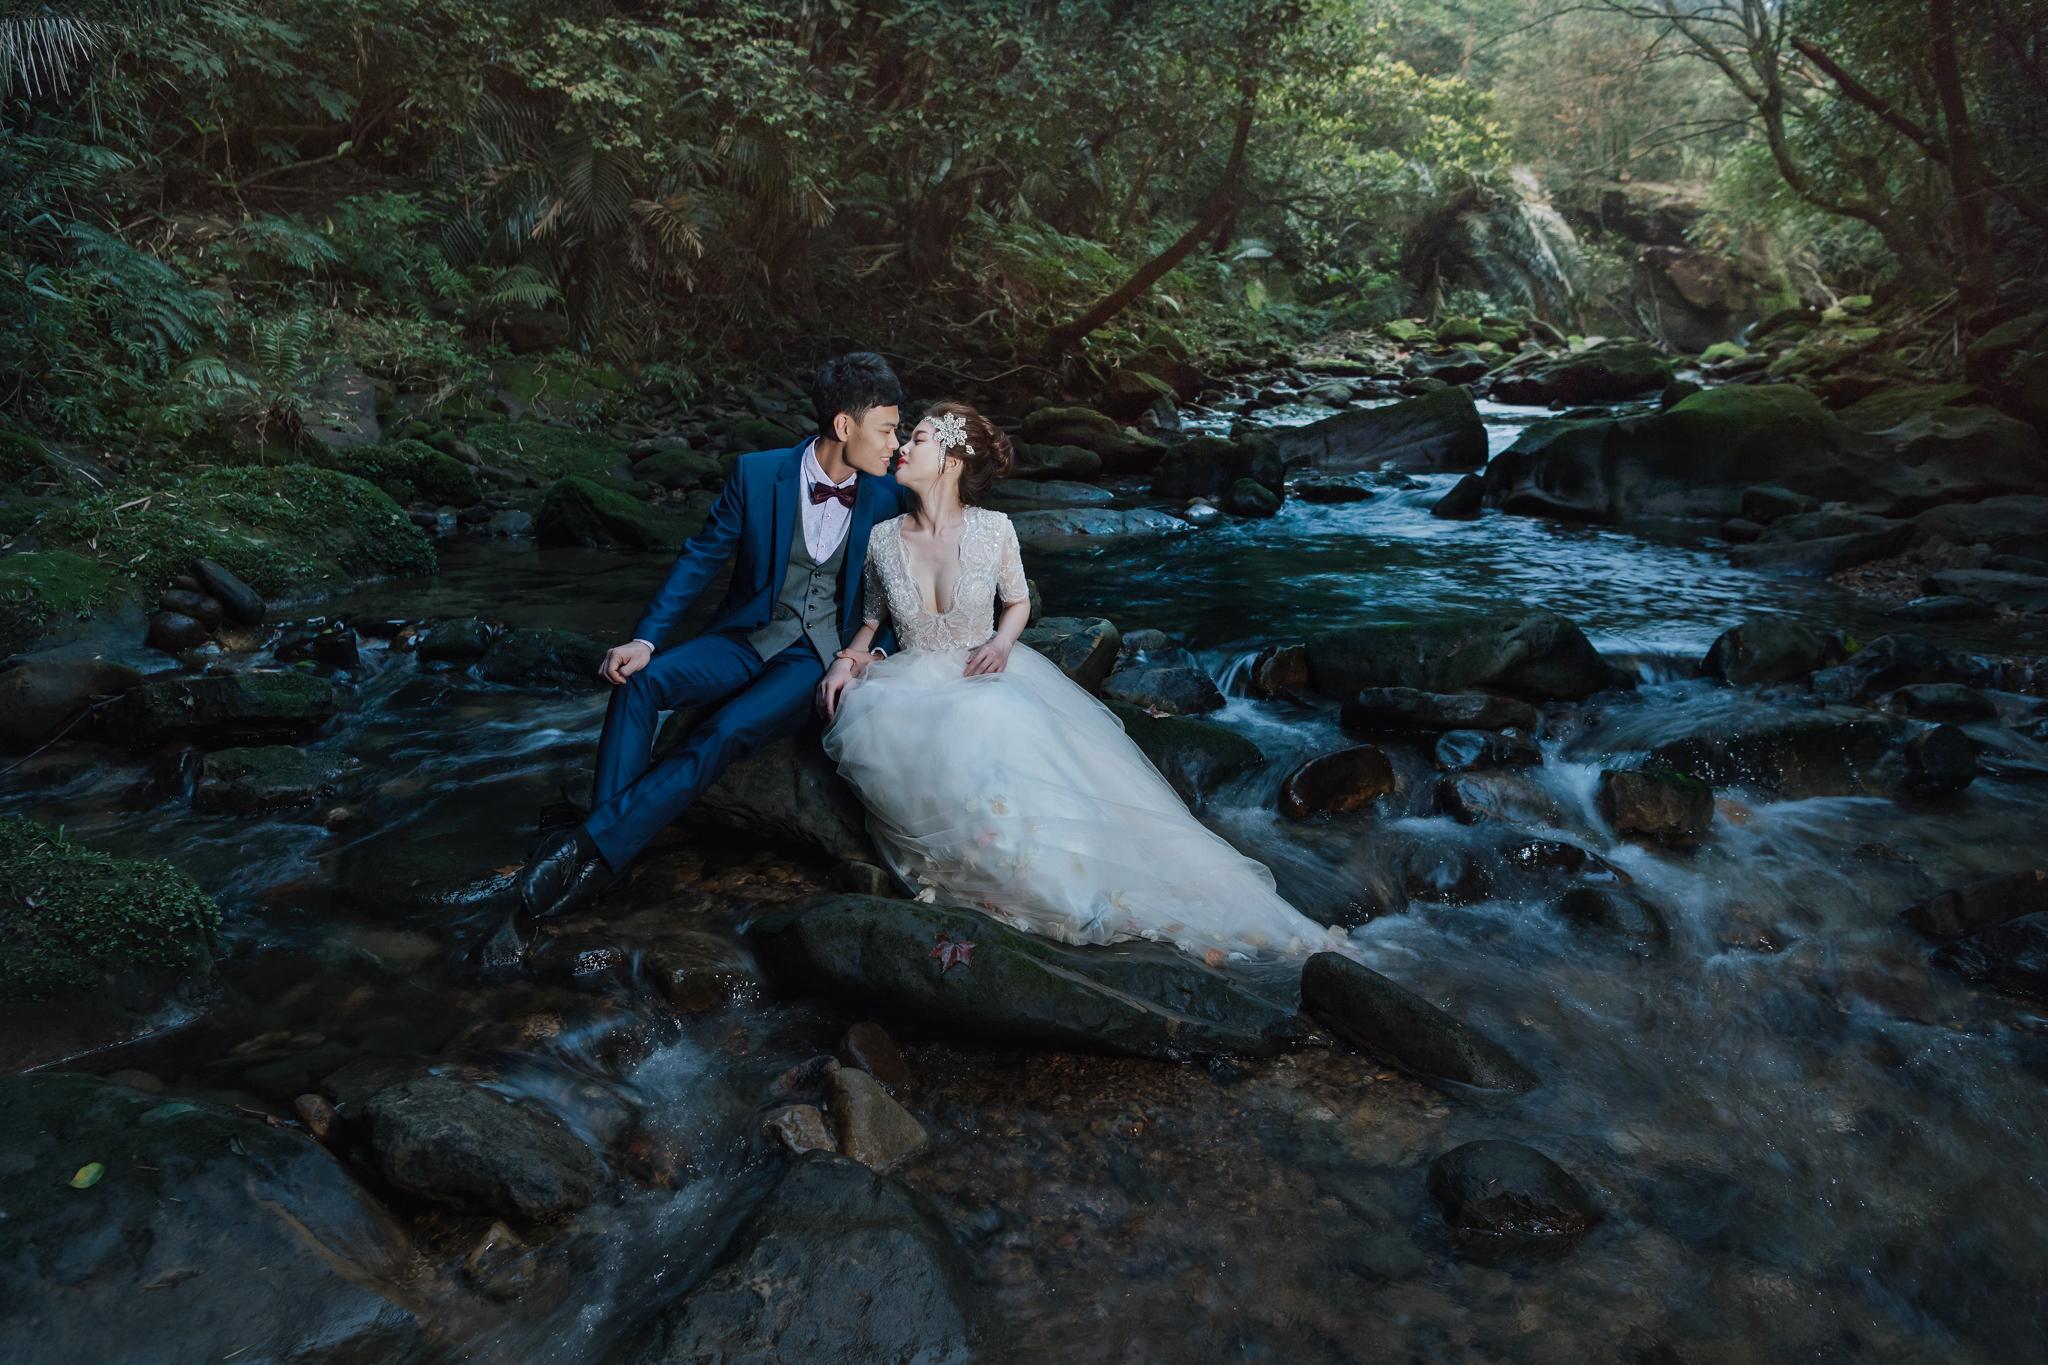 Donfer Photography, EASTERN WEDDING, 自主婚紗, 自助婚紗, 婚紗影像, 藝術婚紗, 東法